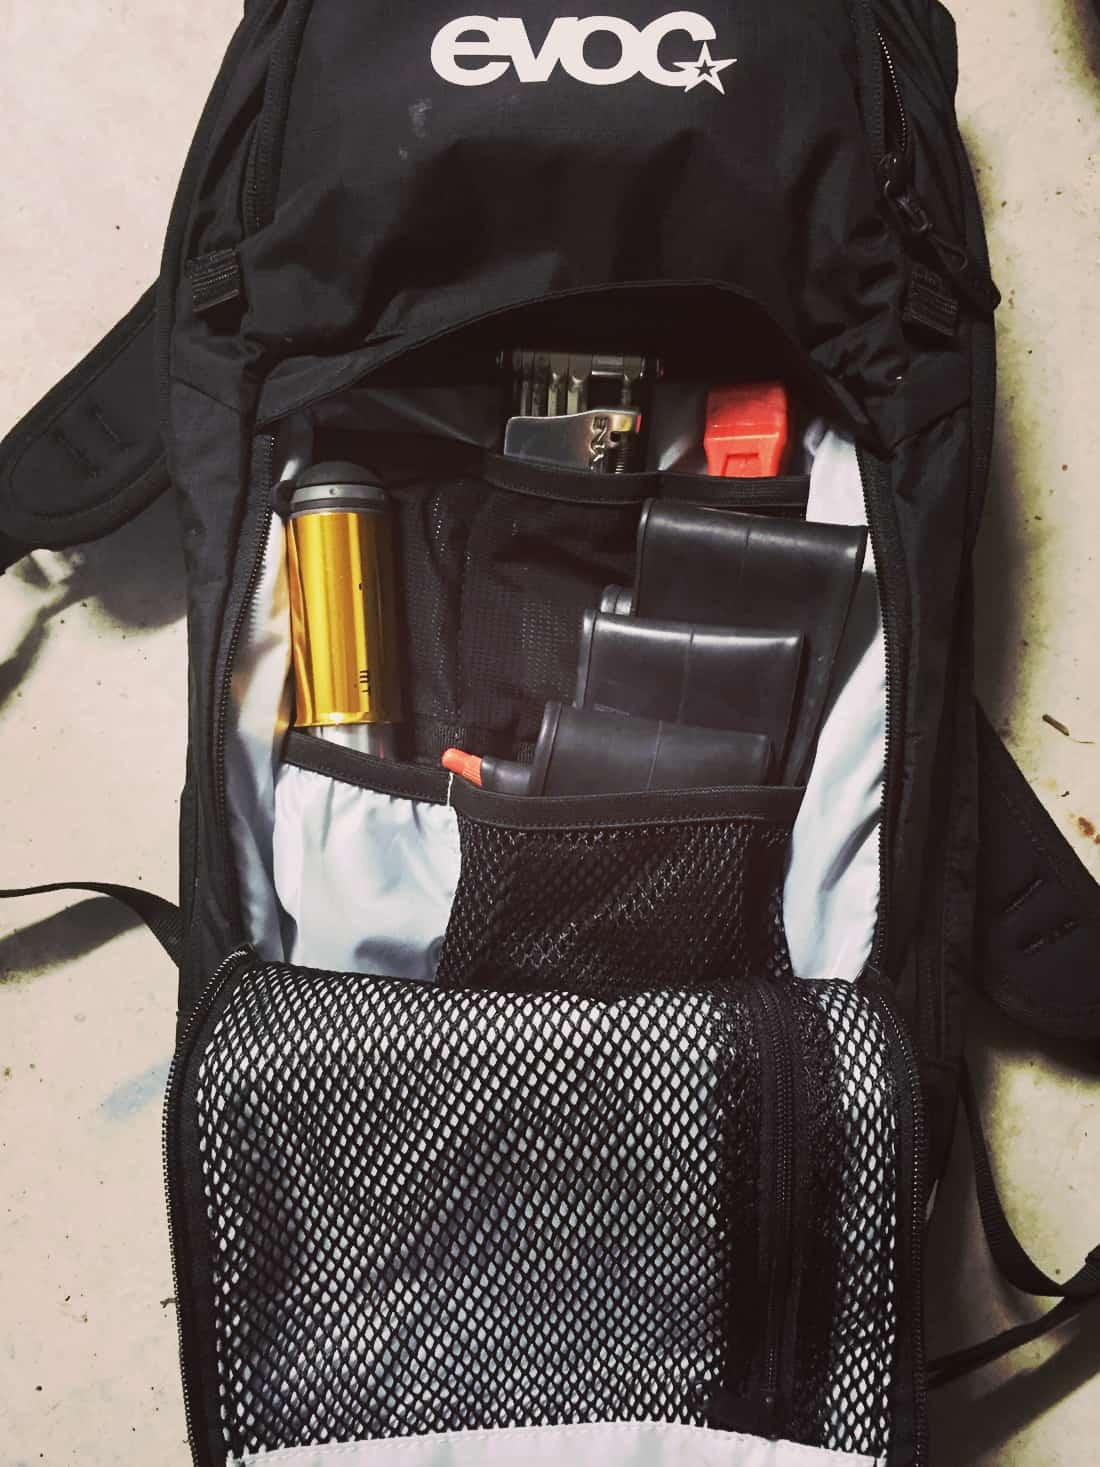 EVOC stage 6 pack